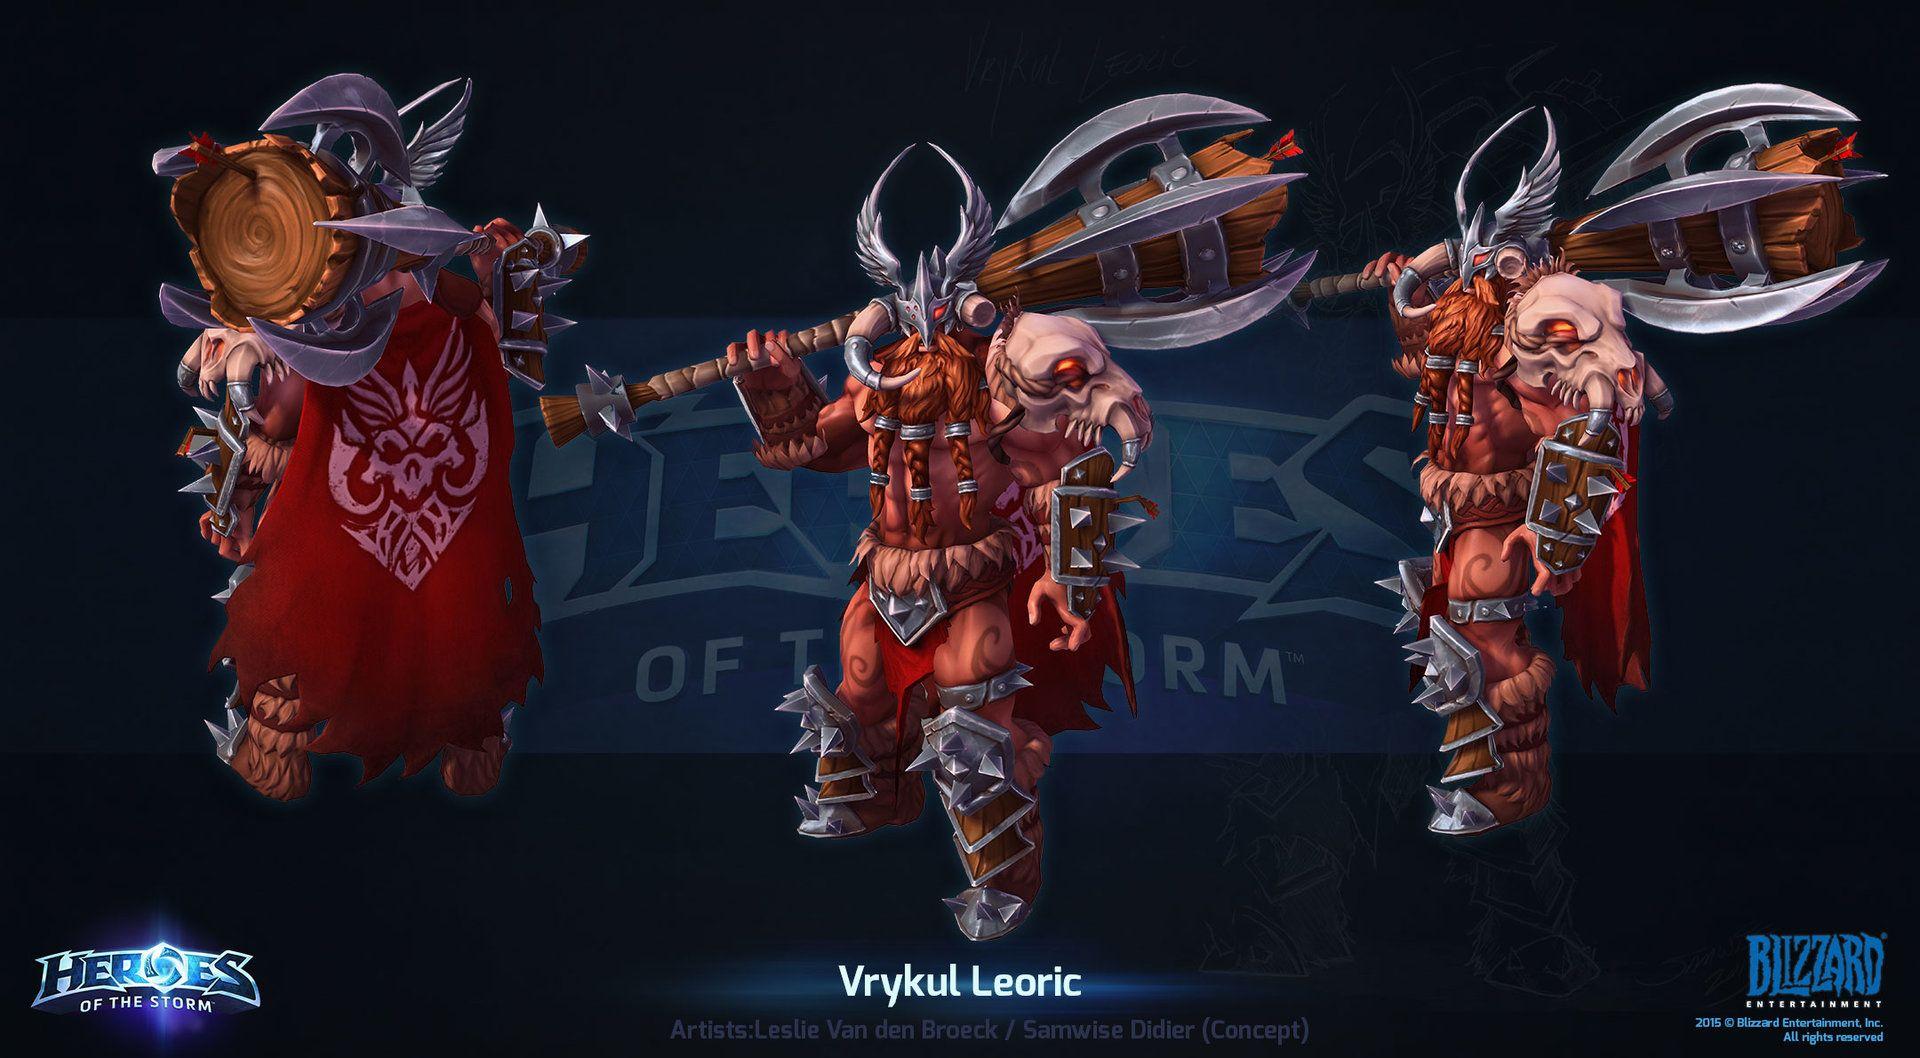 Artstation hots vrykul leoric leslie van den broeck - Heroes of the storm space lord leoric ...